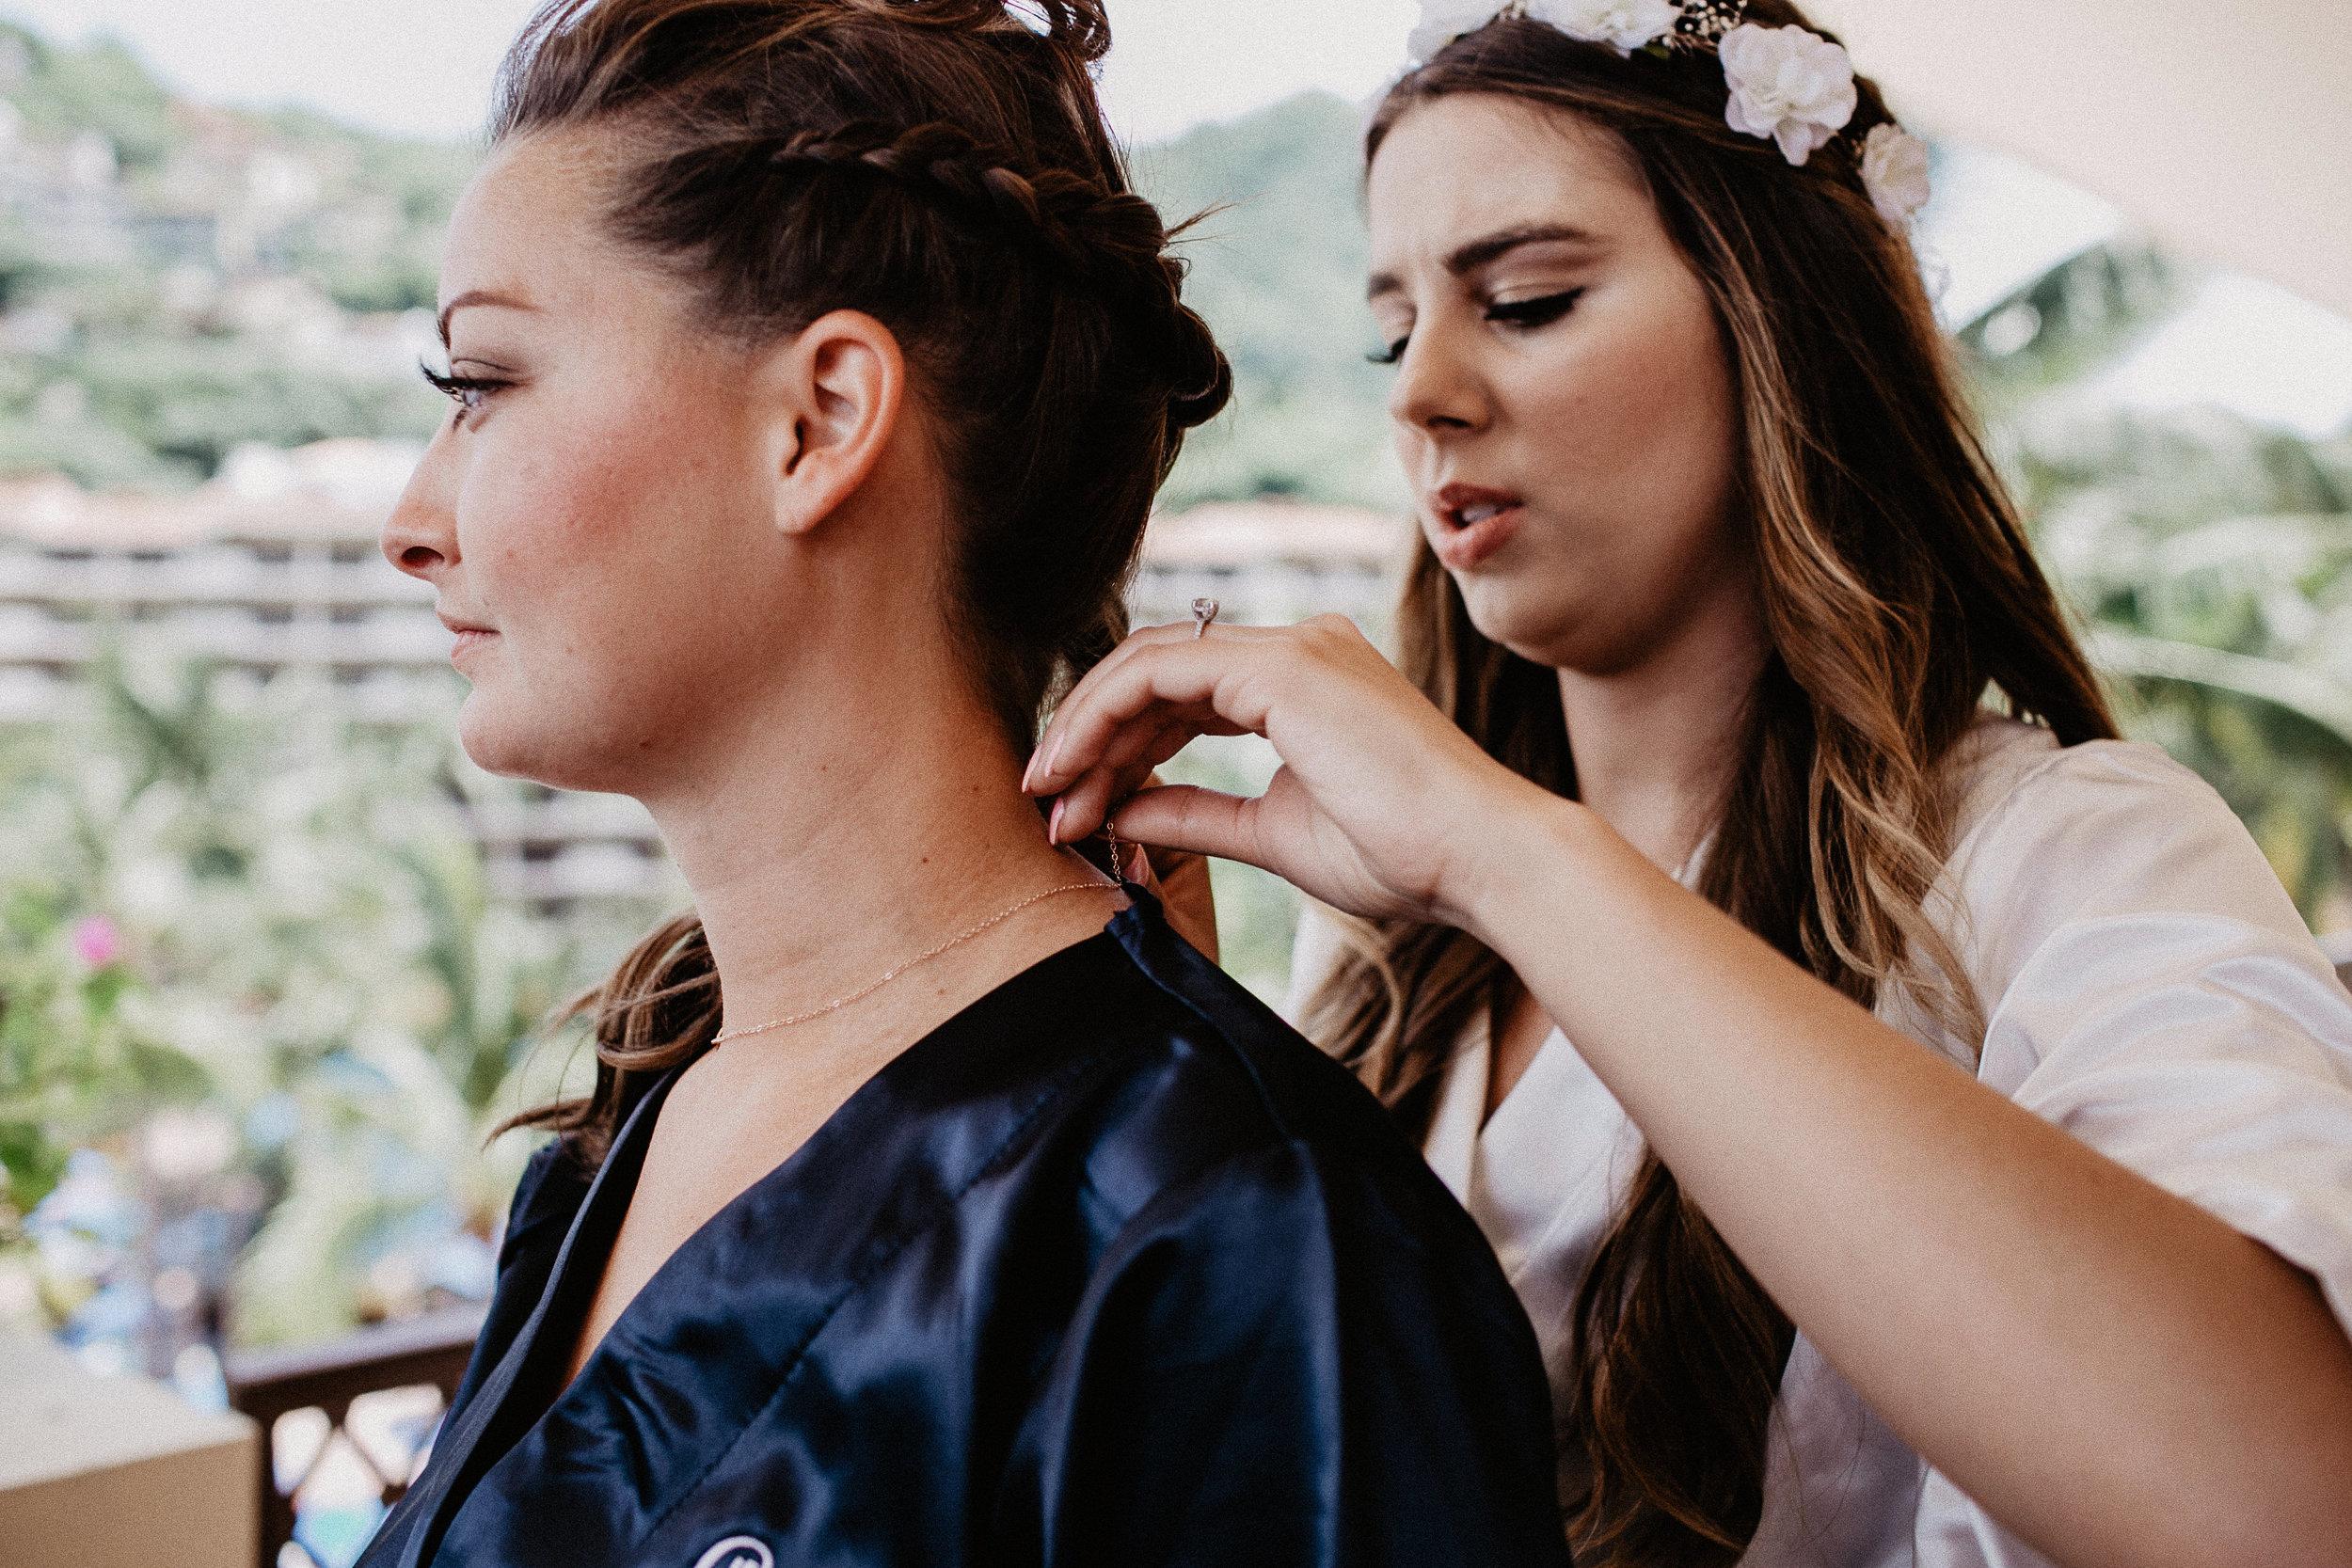 alfonso_flores_destination_wedding_photography_puerto_vallarta_hotel_barcelo_vallarta_cuttler_amela-156.JPG